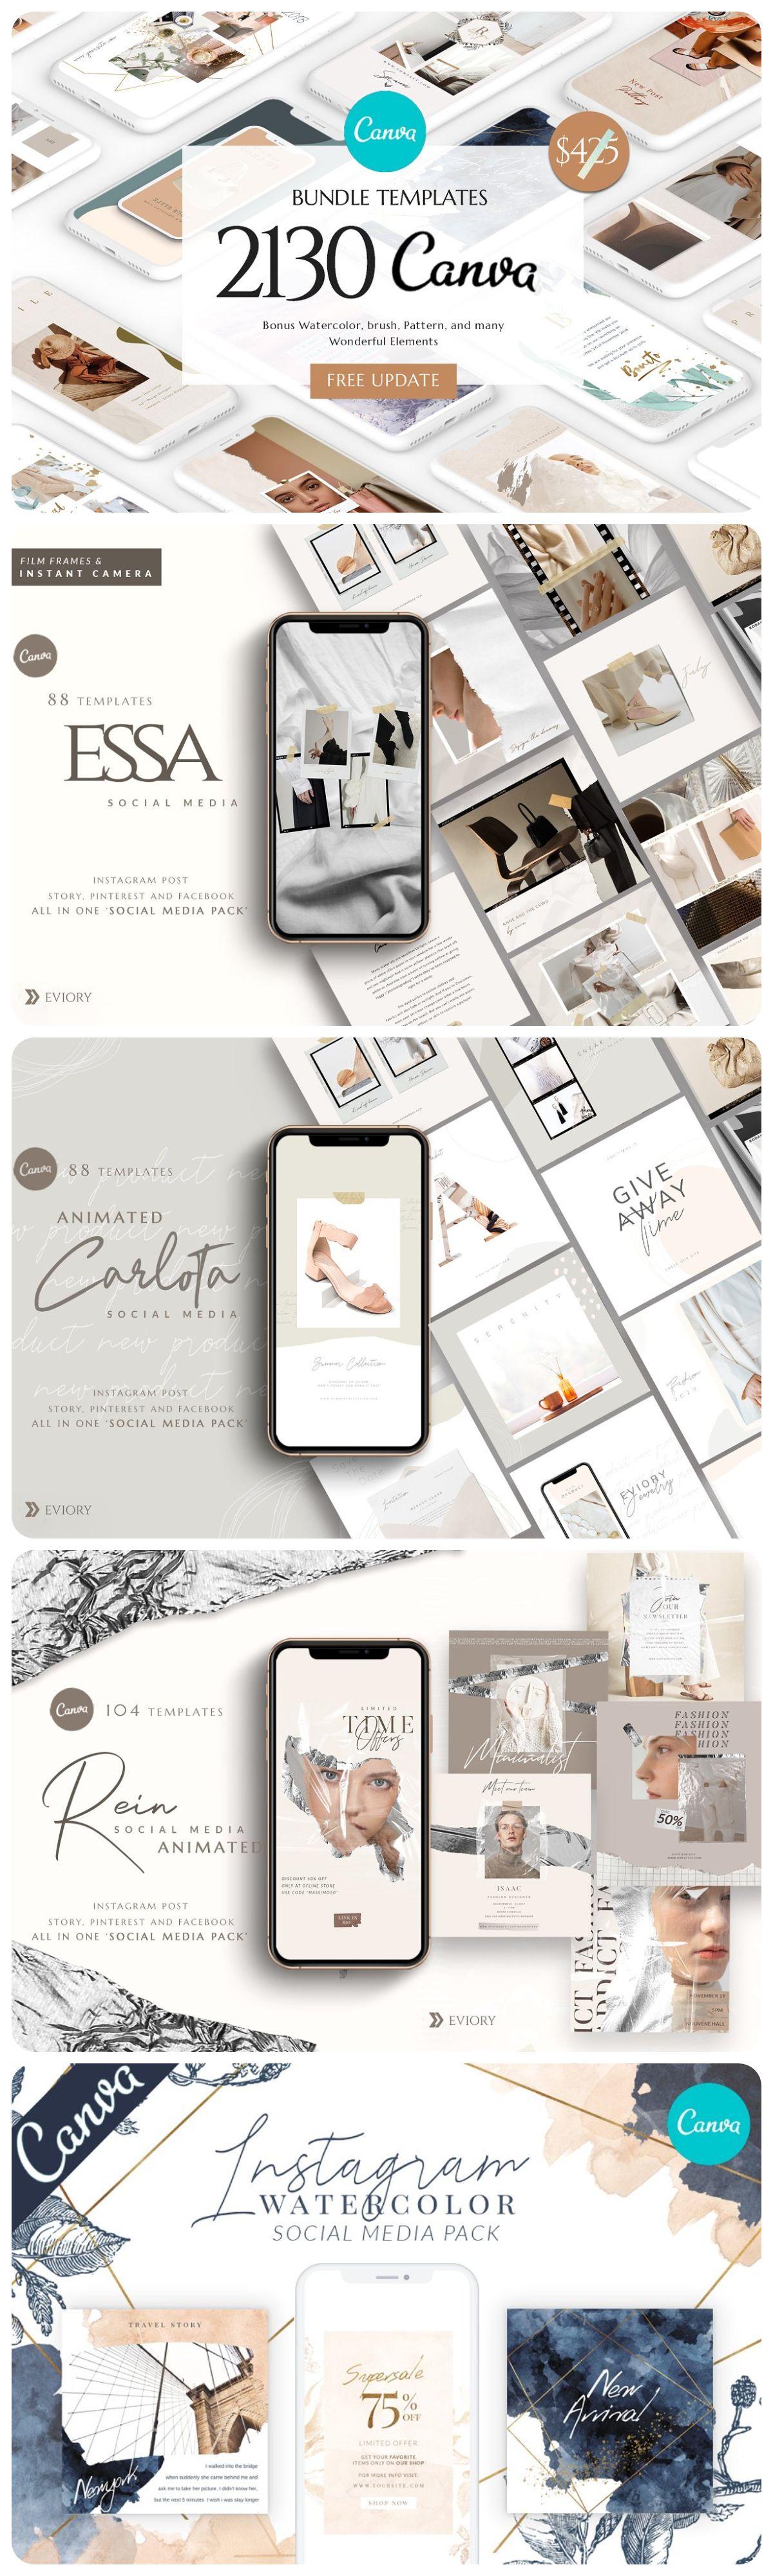 CANVA Bundle Social Media Pack in 2020 Social media pack